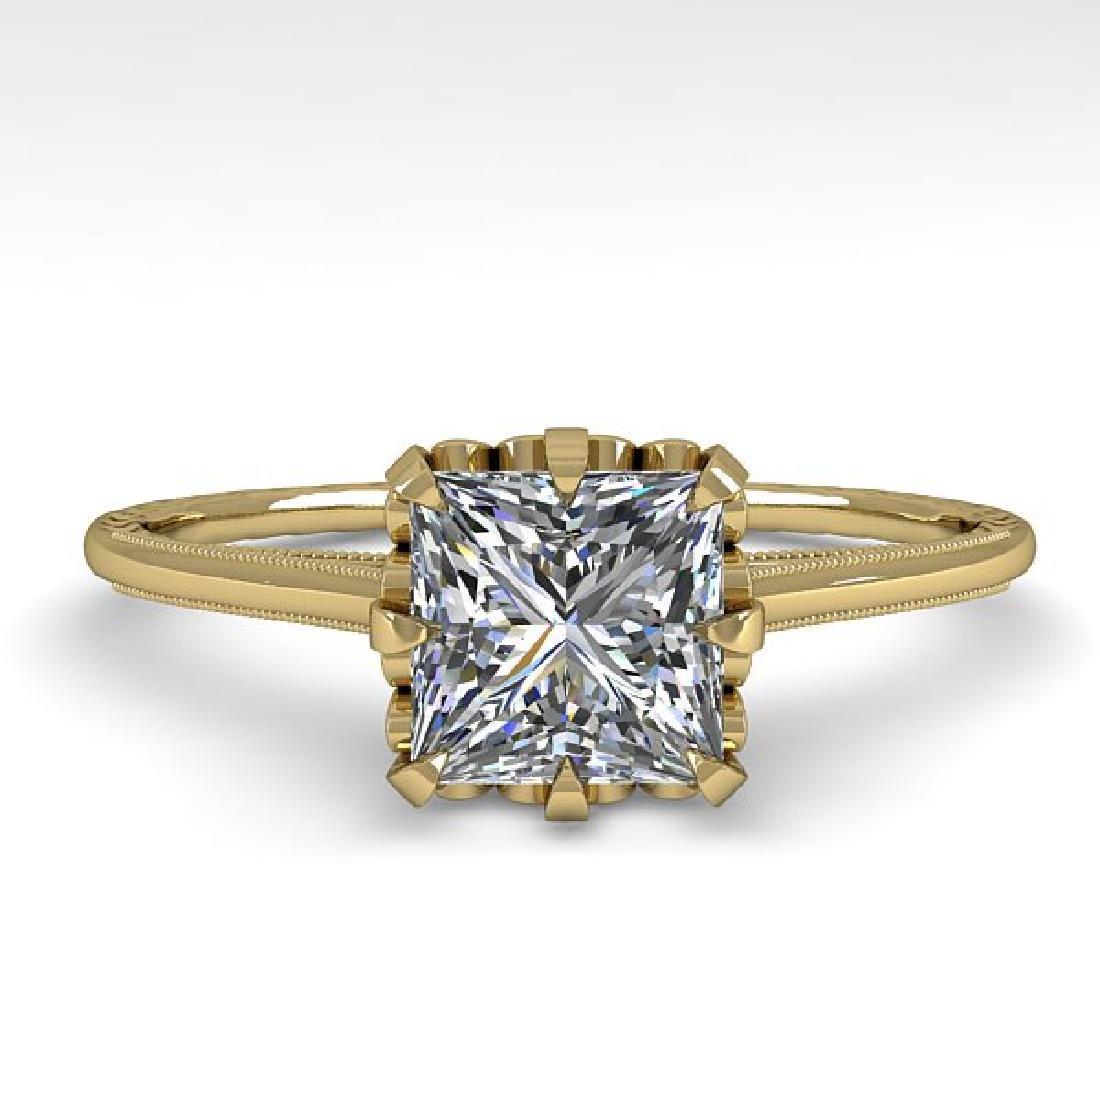 1.0 CTW VS/SI Princess Diamond Solitaire Ring 14K